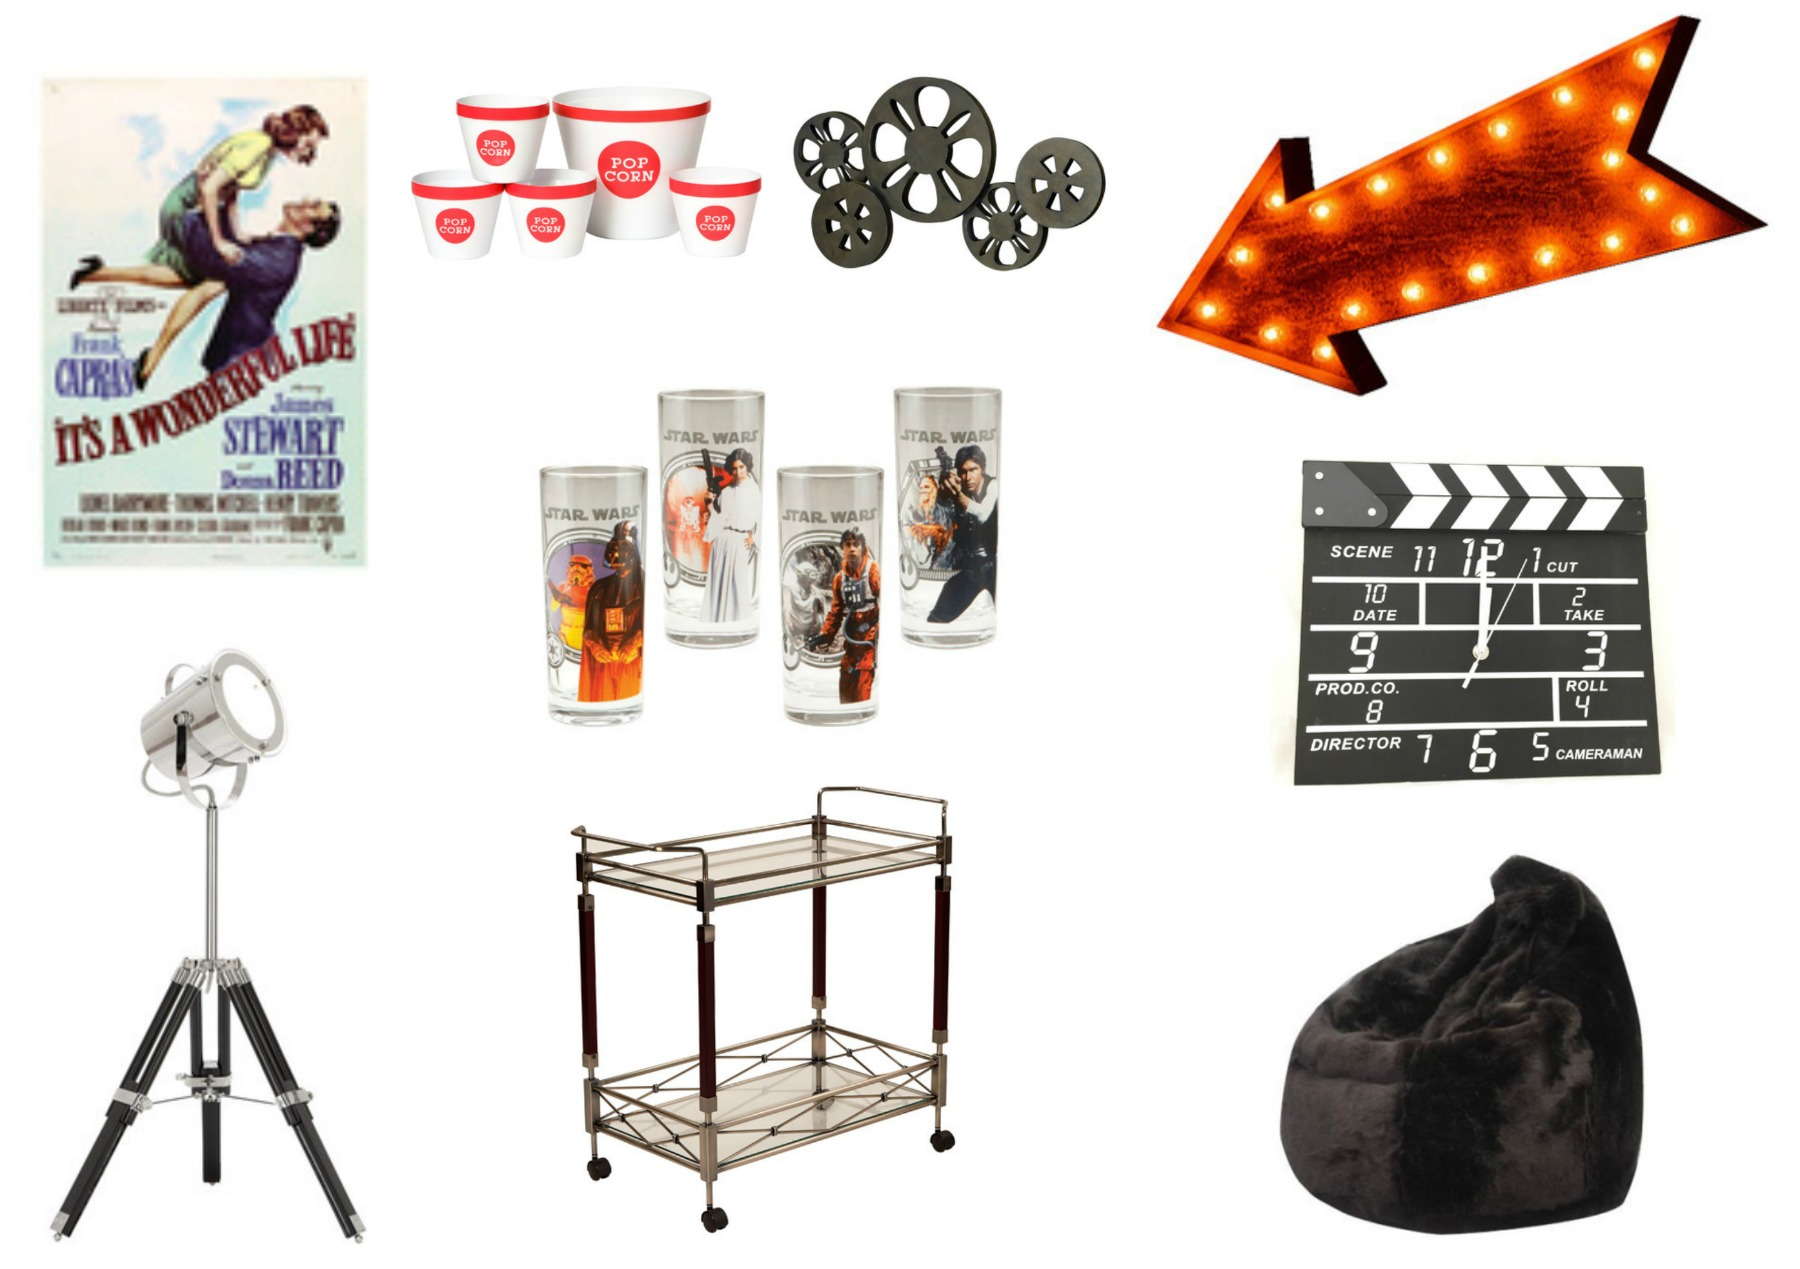 Home Theatre Gift Guide